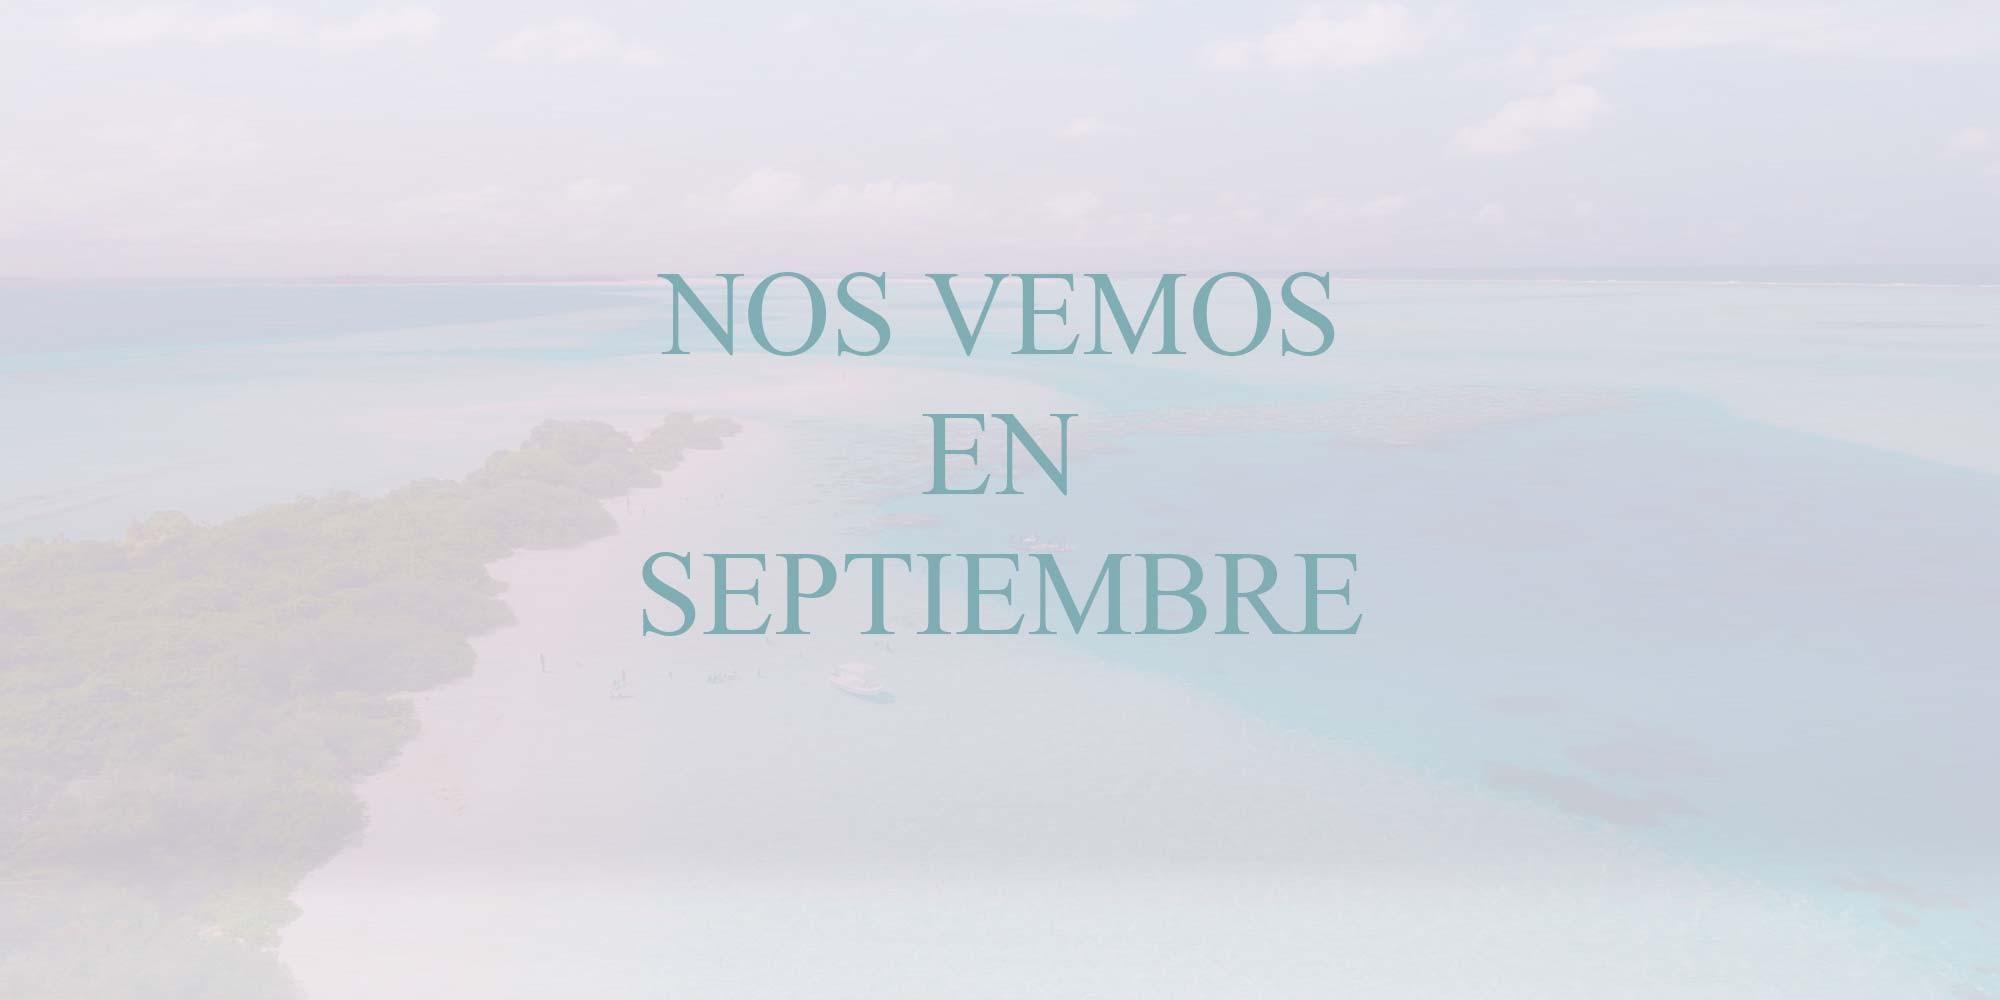 Nos vemos en Septiembre